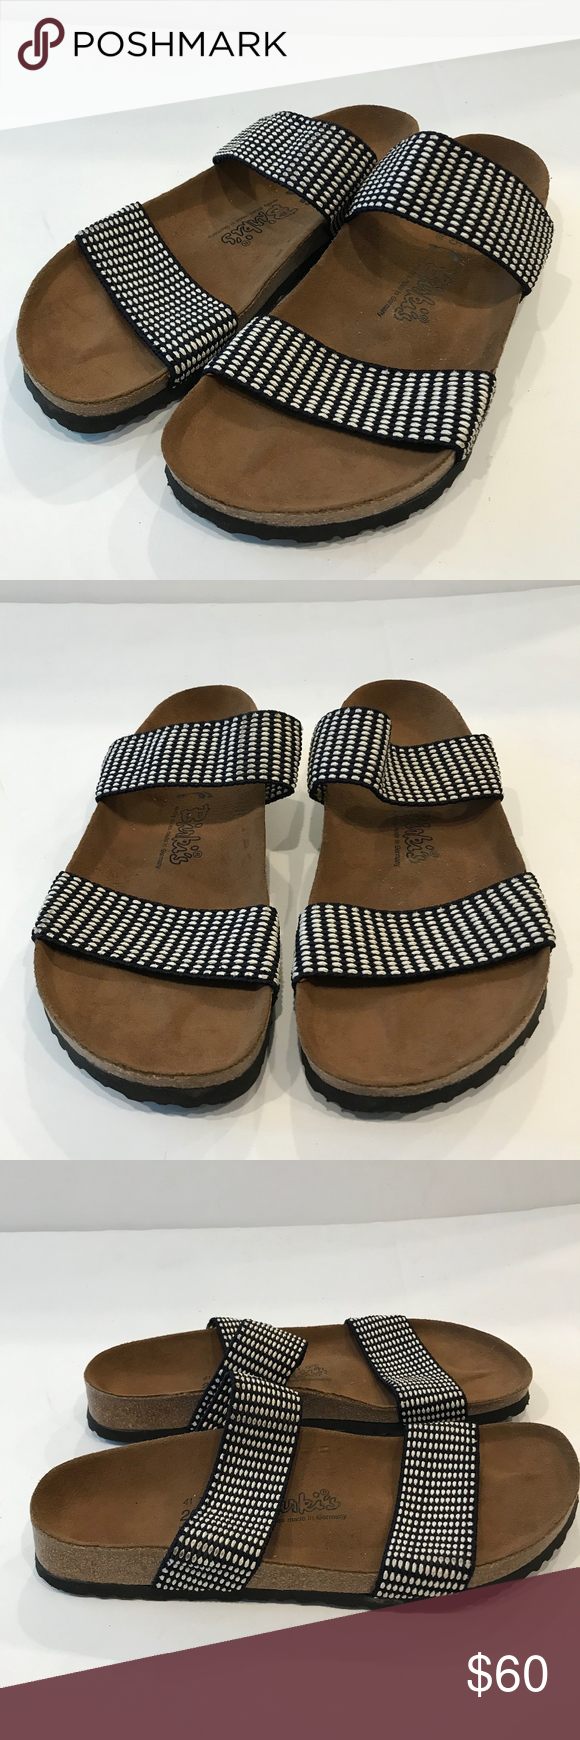 BIRKI'S Curacao Woven Stretch Sandals 10 Birkenstock BIRKI'S